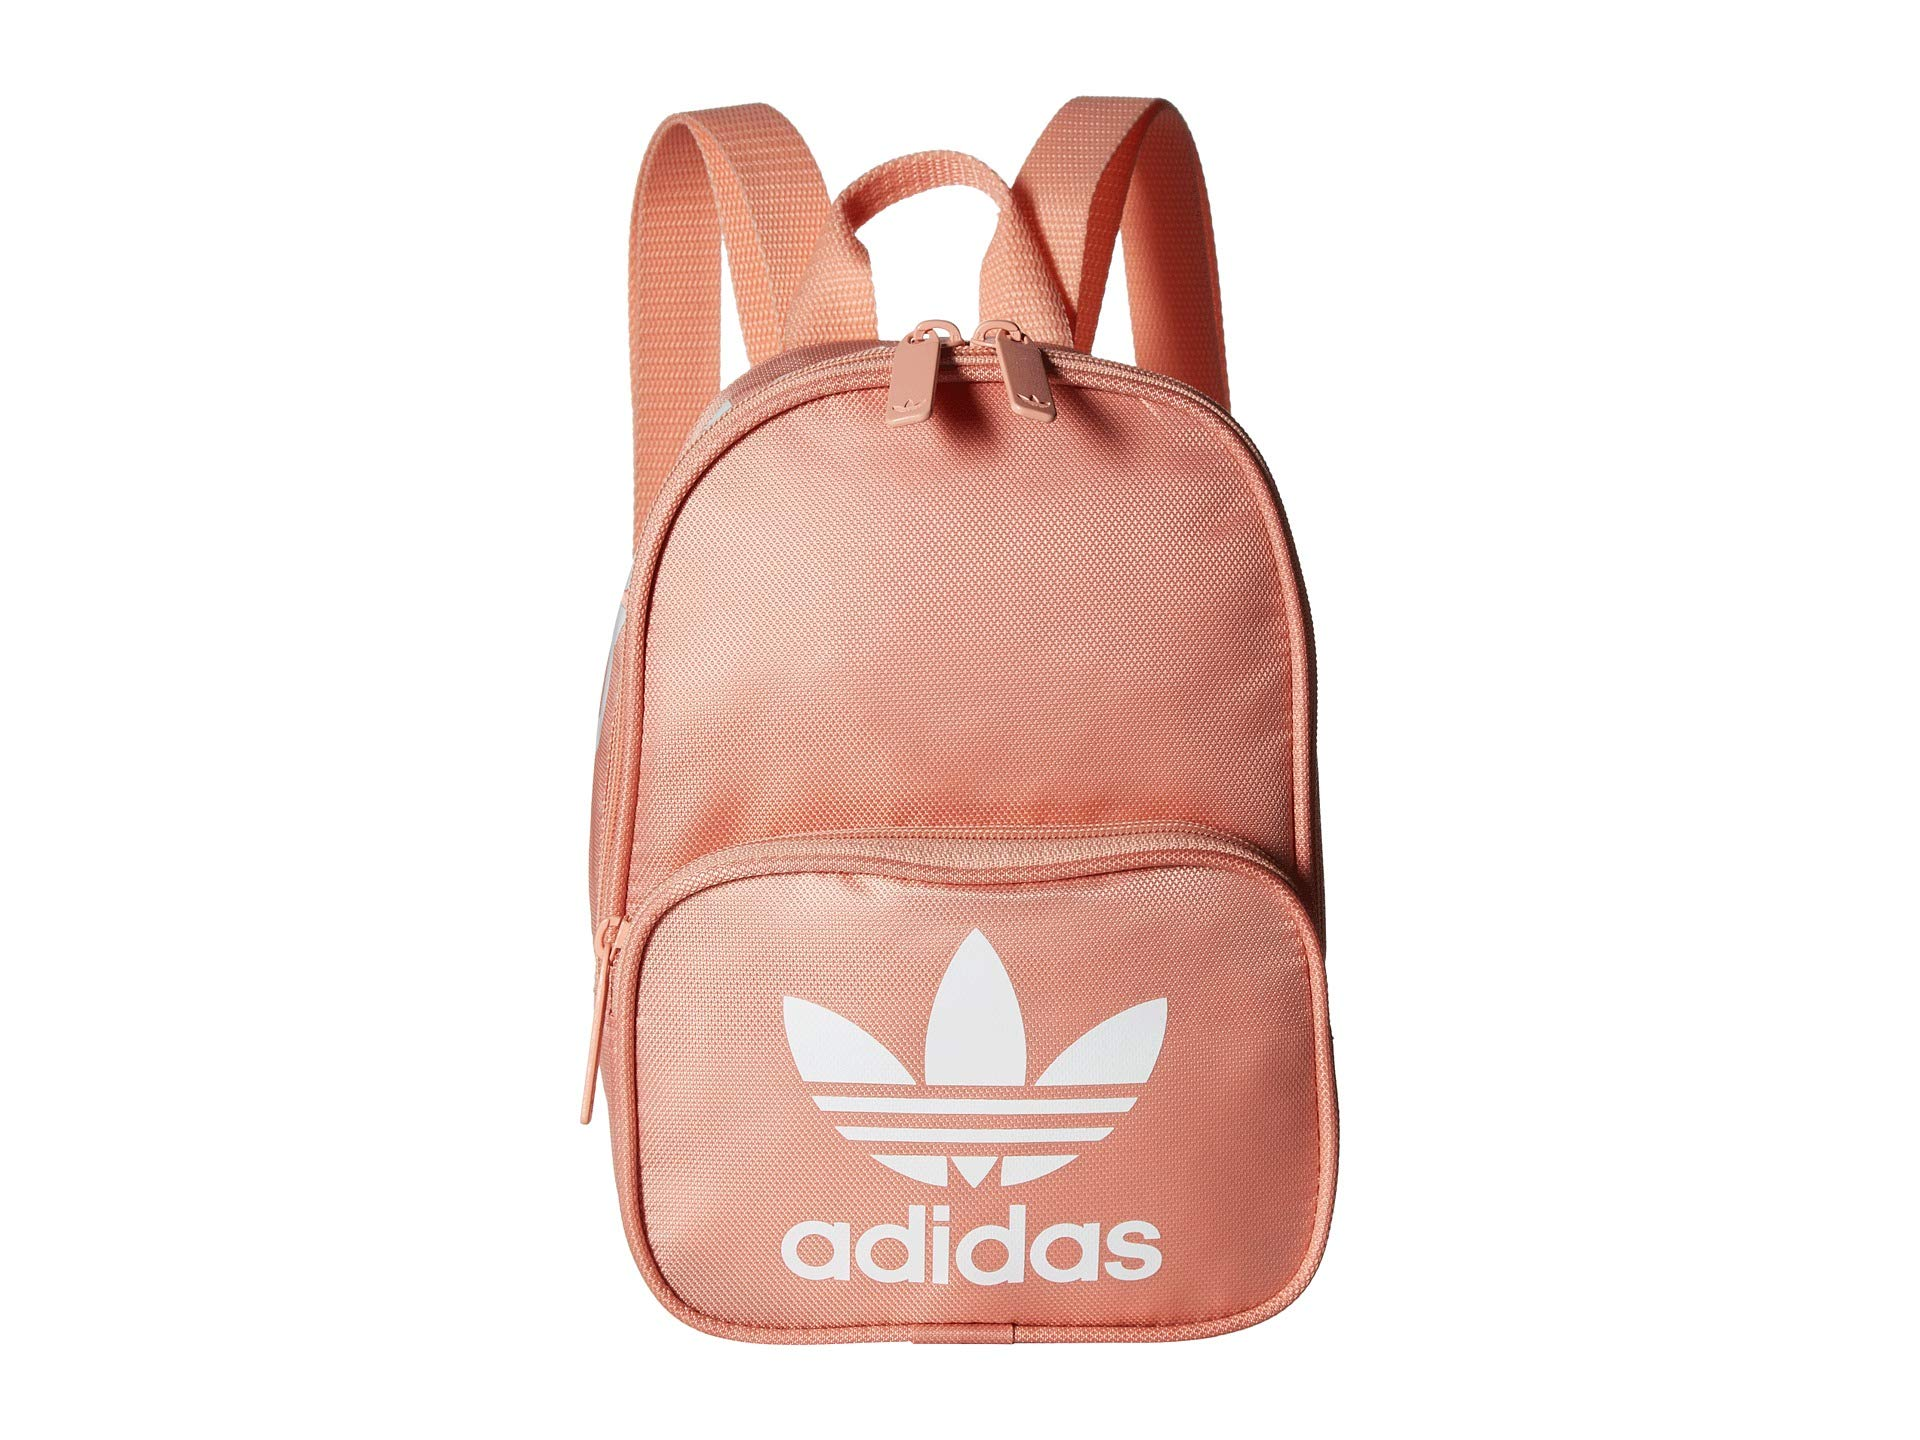 Adidas Backpack Dust Pink Santiago Originals Mini RqrRBg